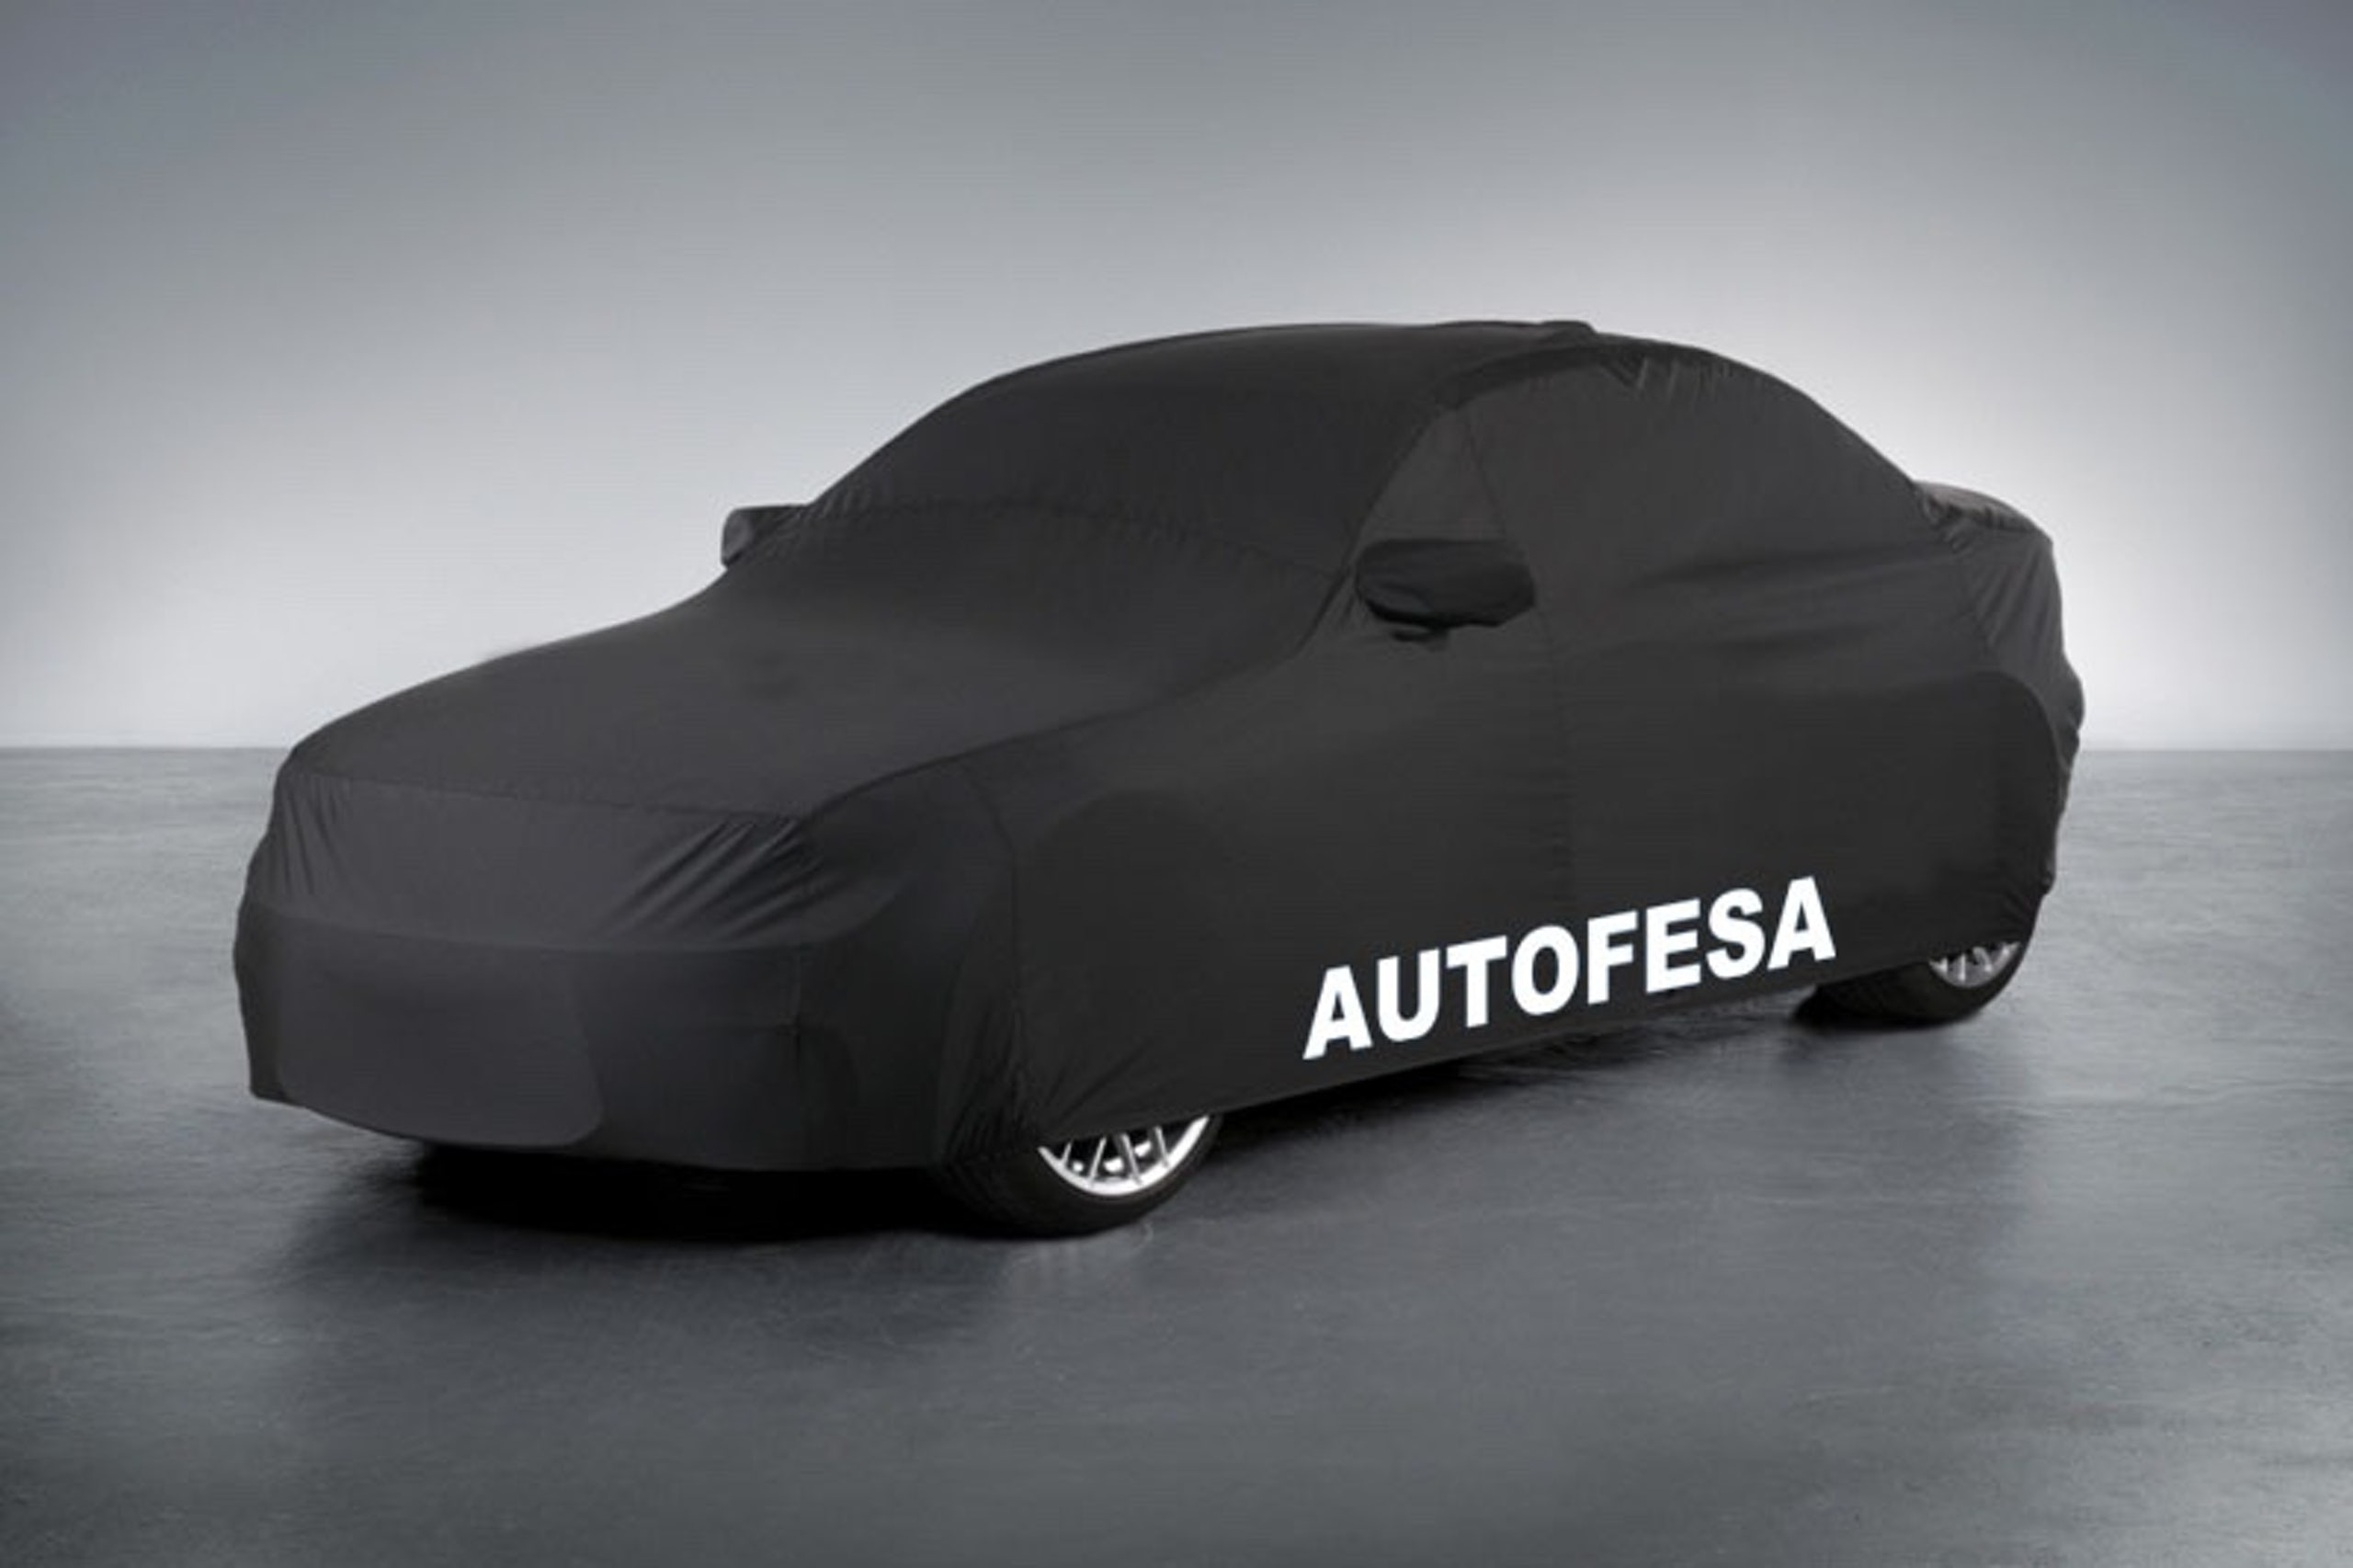 Peugeot Rcz 2.0 HDi 163cv Asphalt 2p FAP - Foto 25